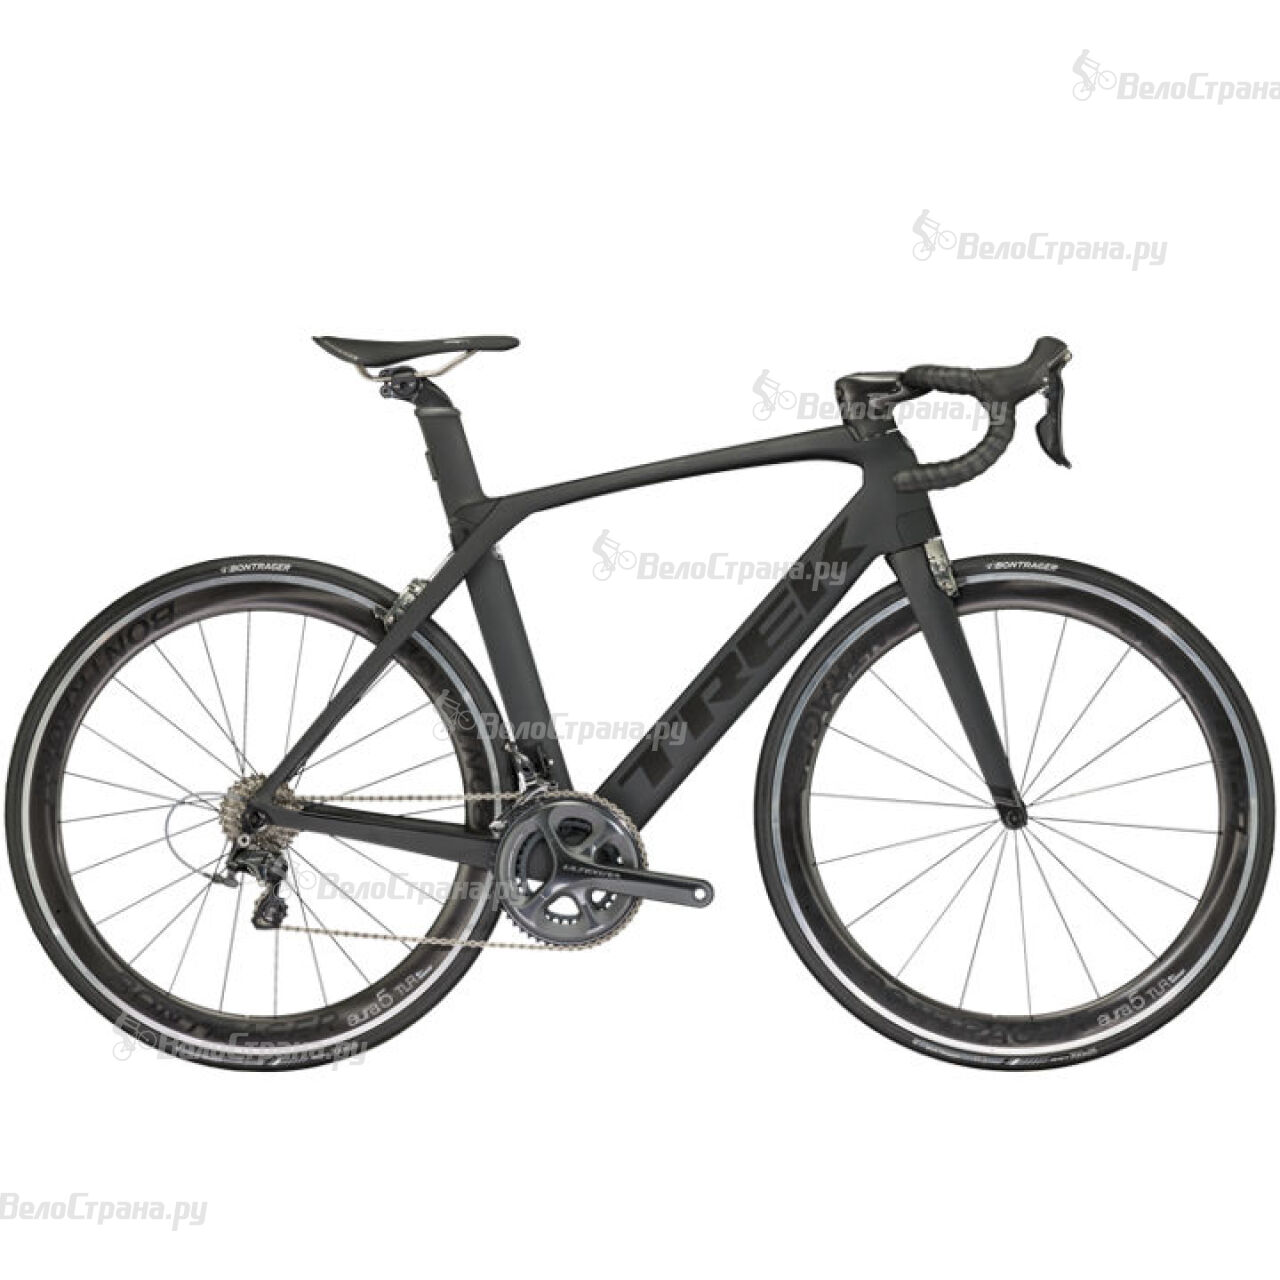 Велосипед Trek MADONE 9.2 C H2 (2017) велосипед trek madone 9 5 c wsd udi2 2017